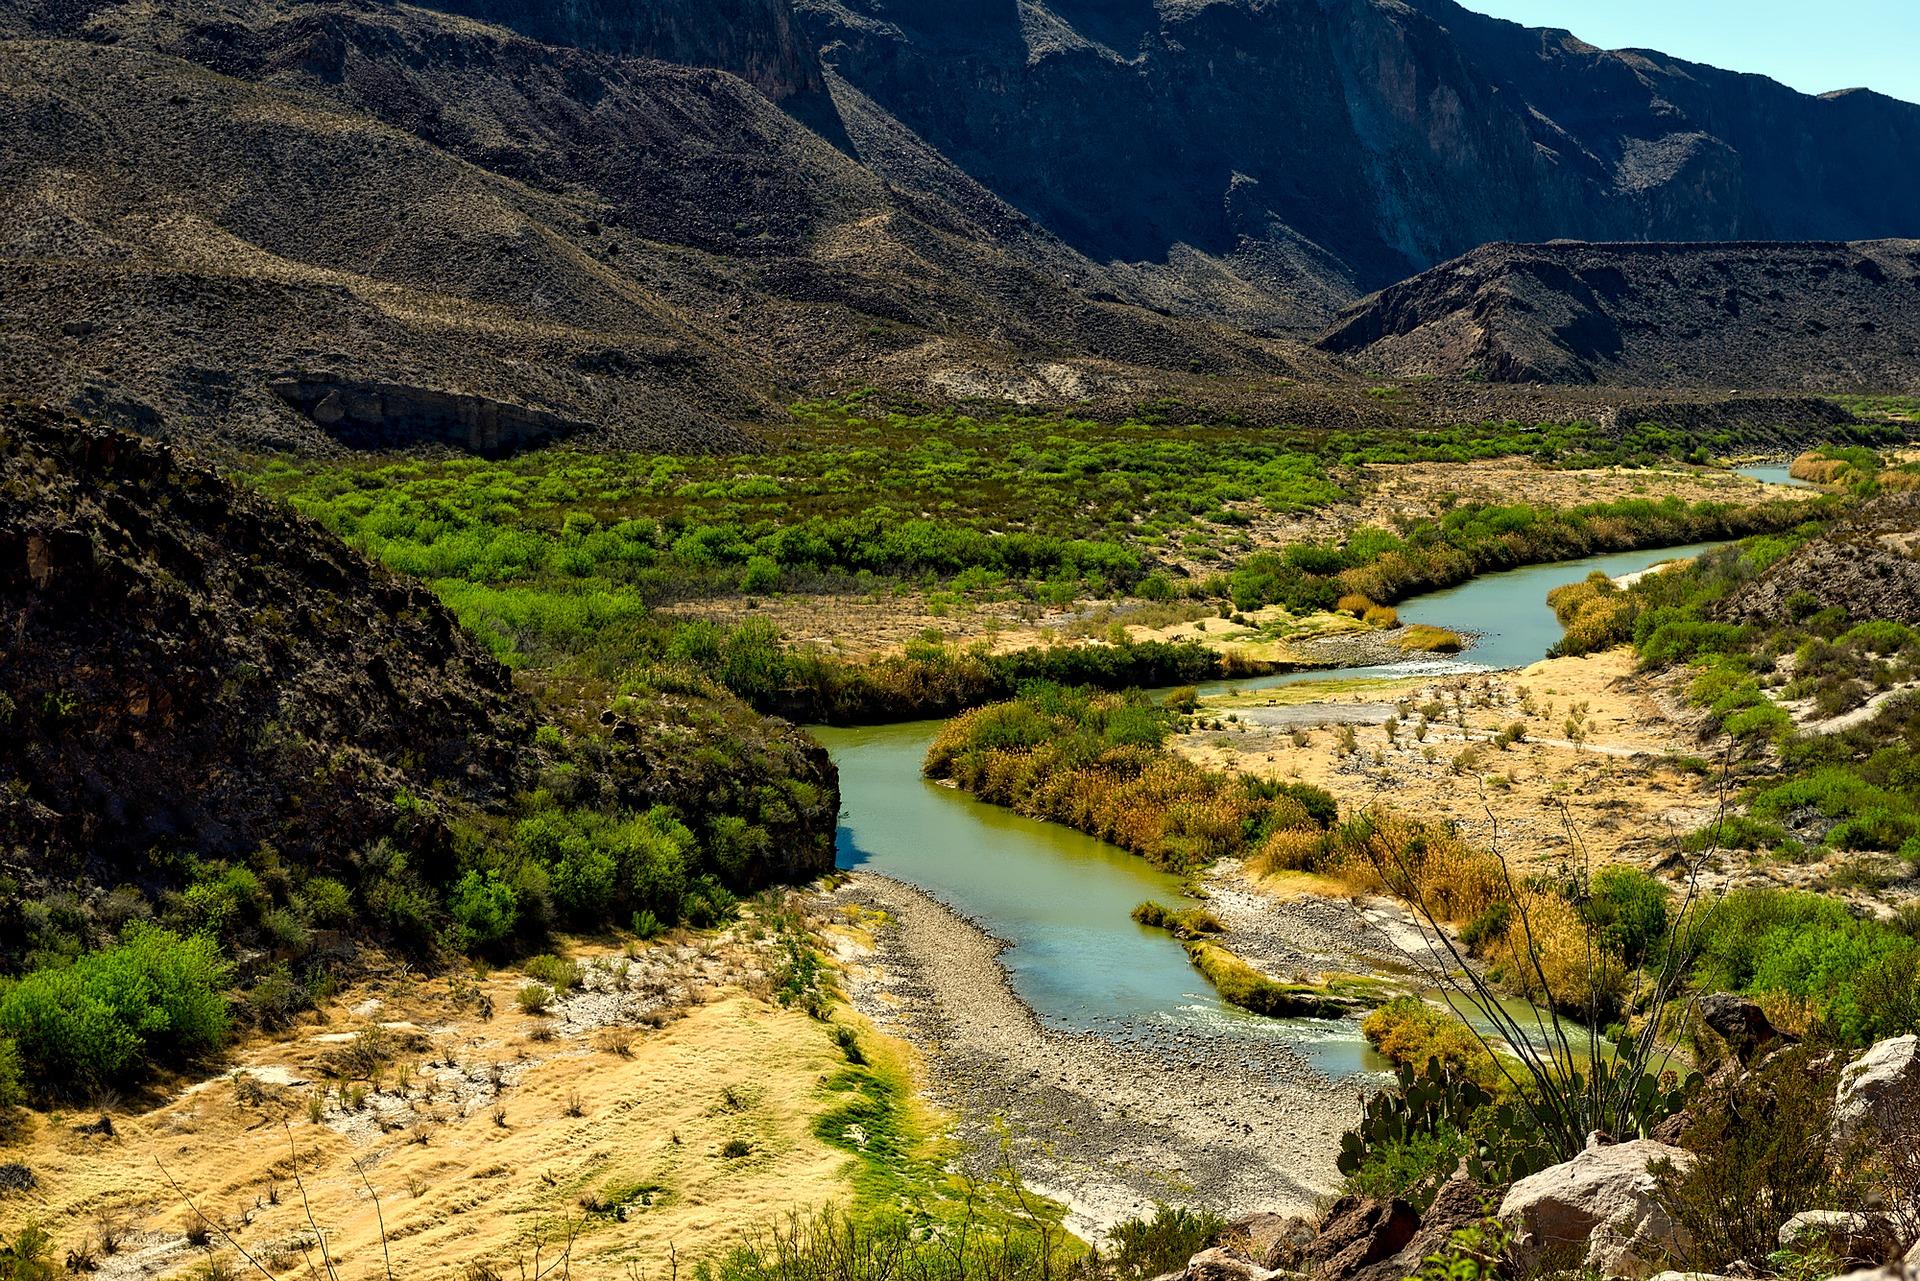 Beautiful view on landscape of Rio Grande River, Texas